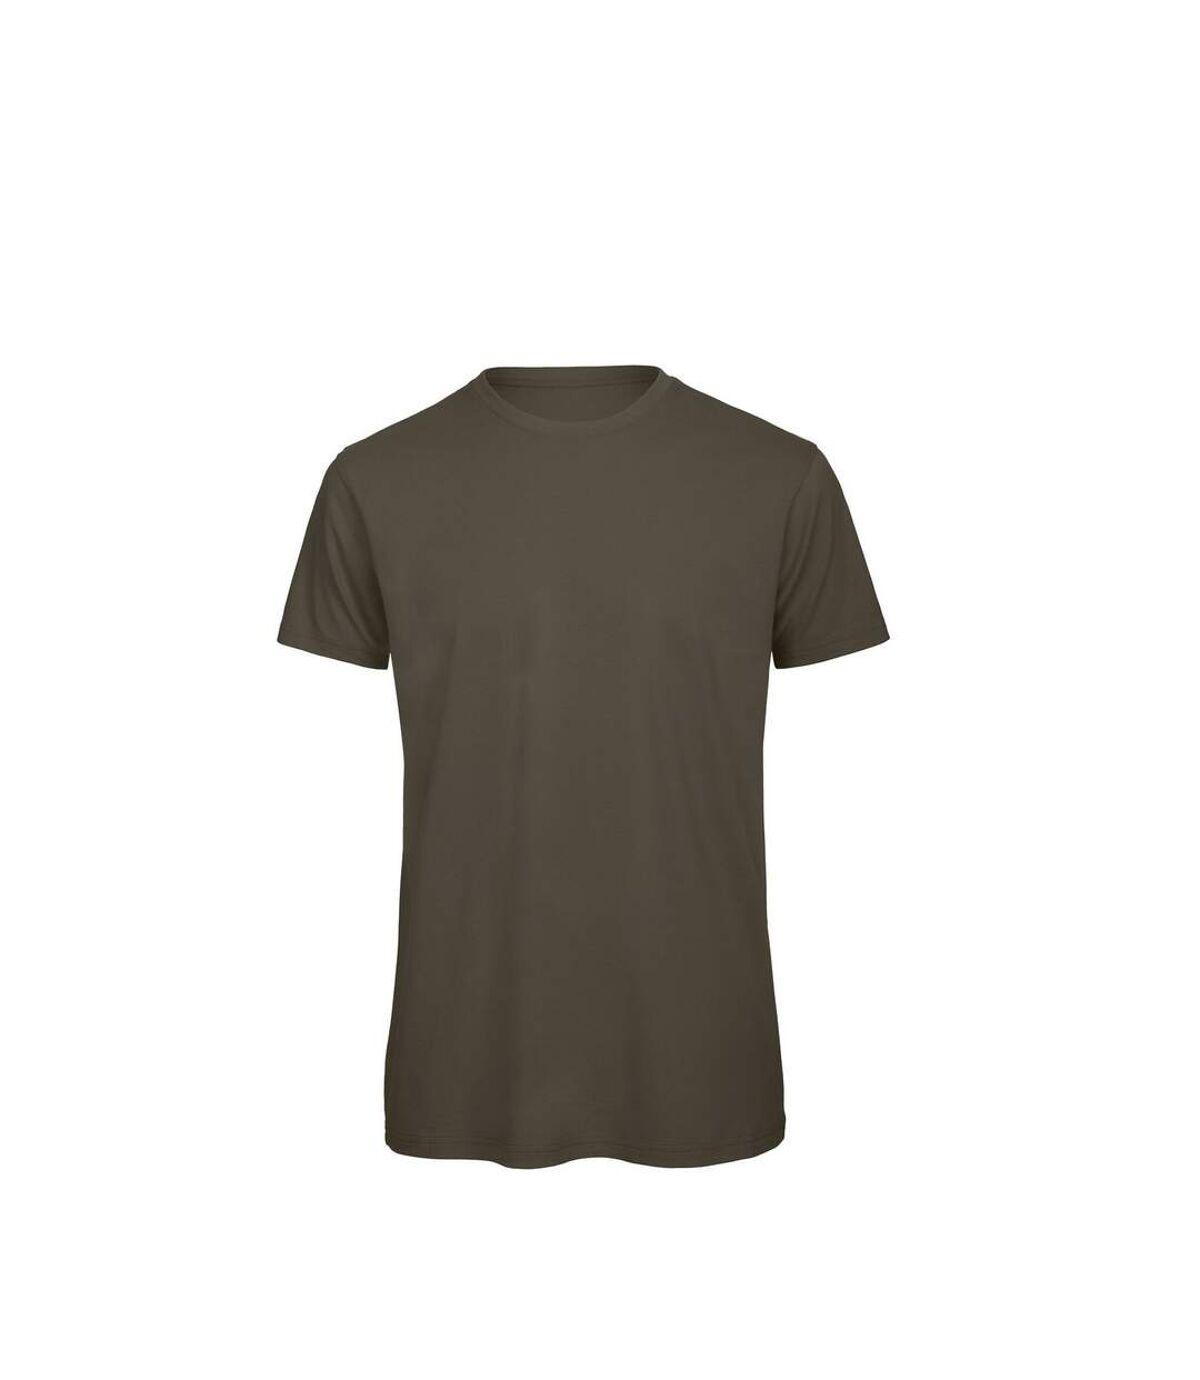 B&C Mens Favourite Organic Cotton Crew T-Shirt (Khaki) - UTBC3635